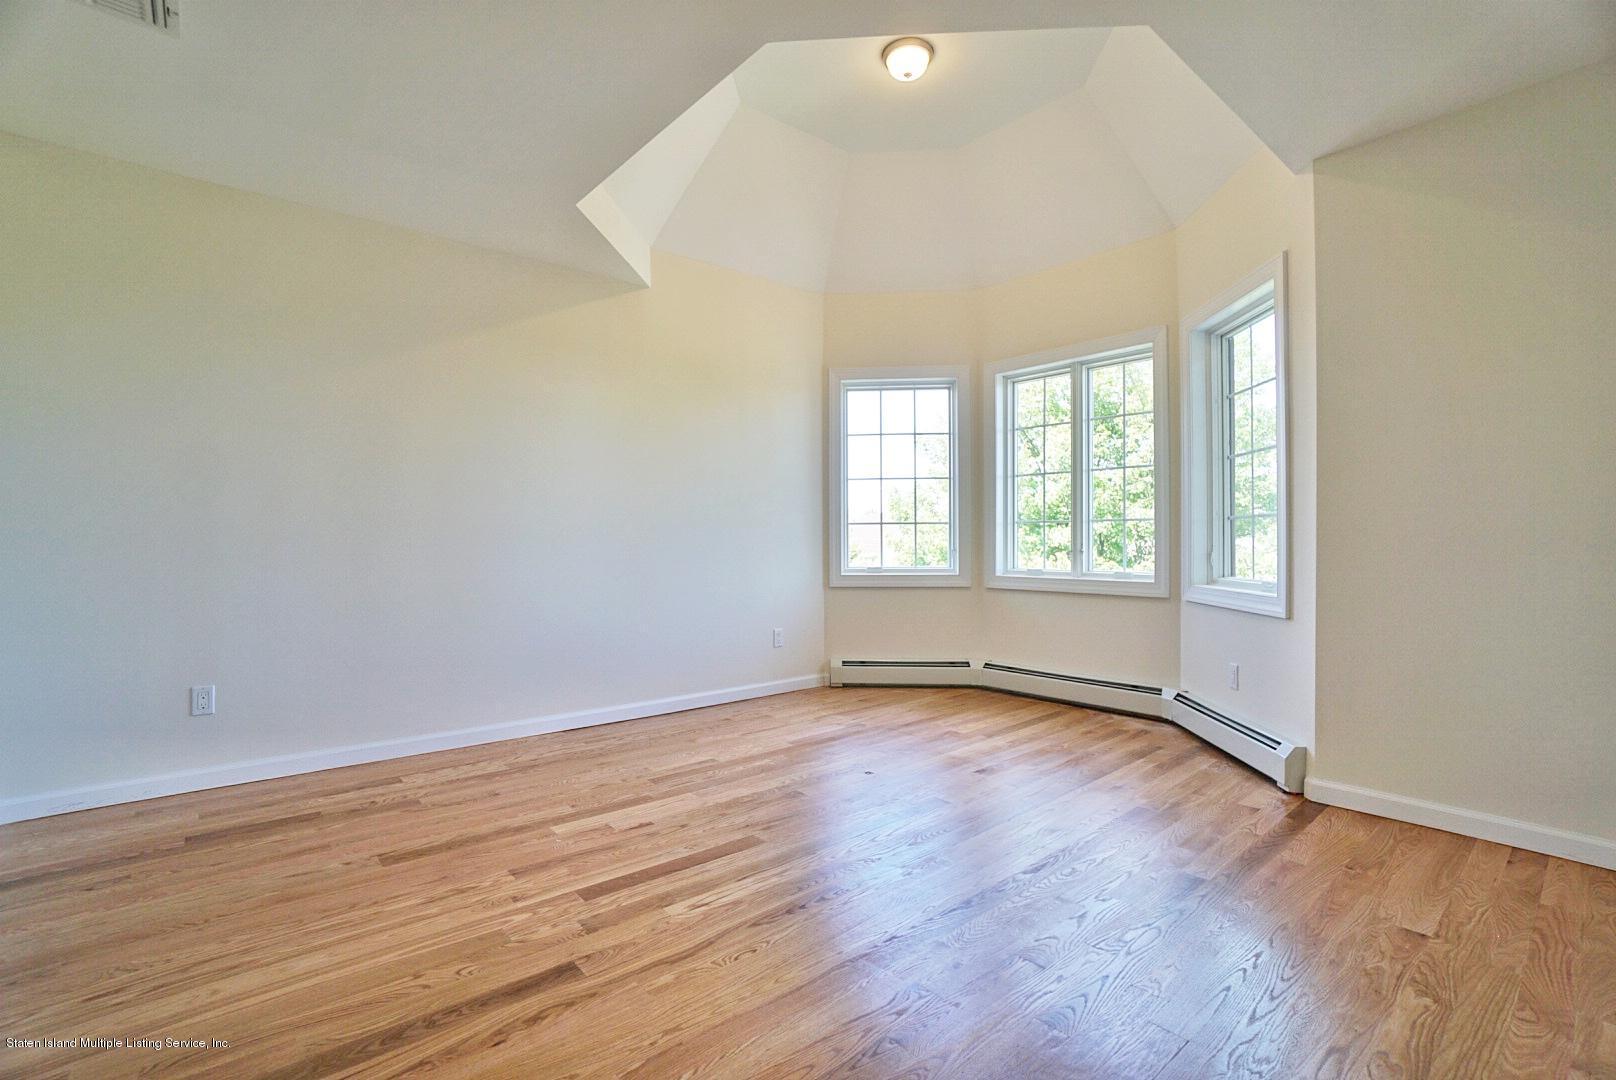 Single Family - Detached 678 Yetman Avenue  Staten Island, NY 10307, MLS-1132766-39